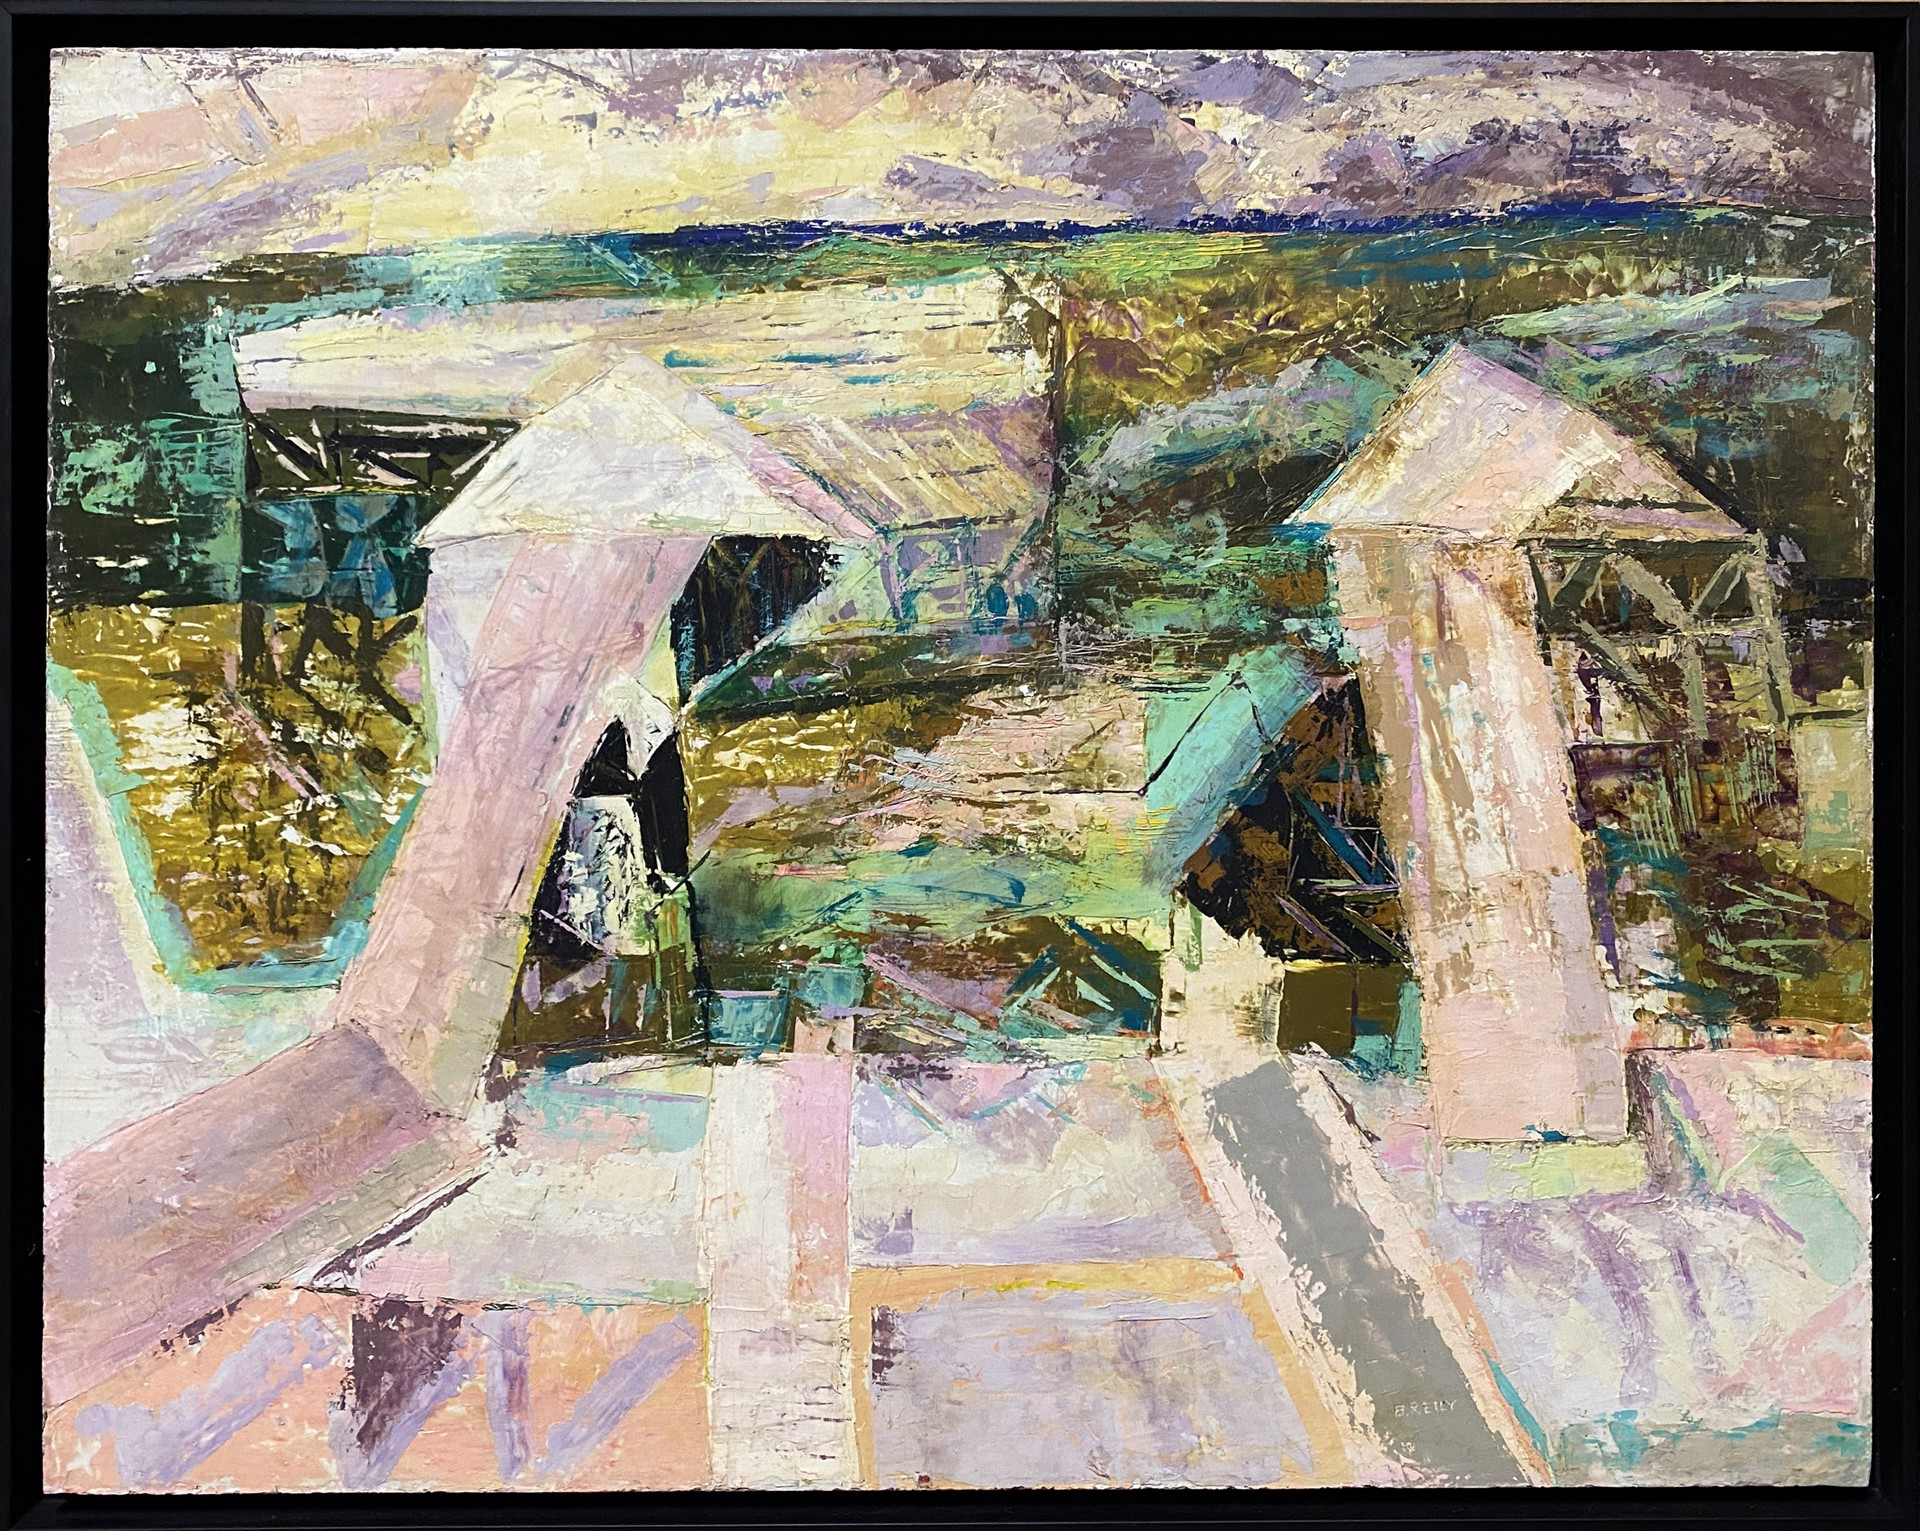 Cabanas by Bill Reily